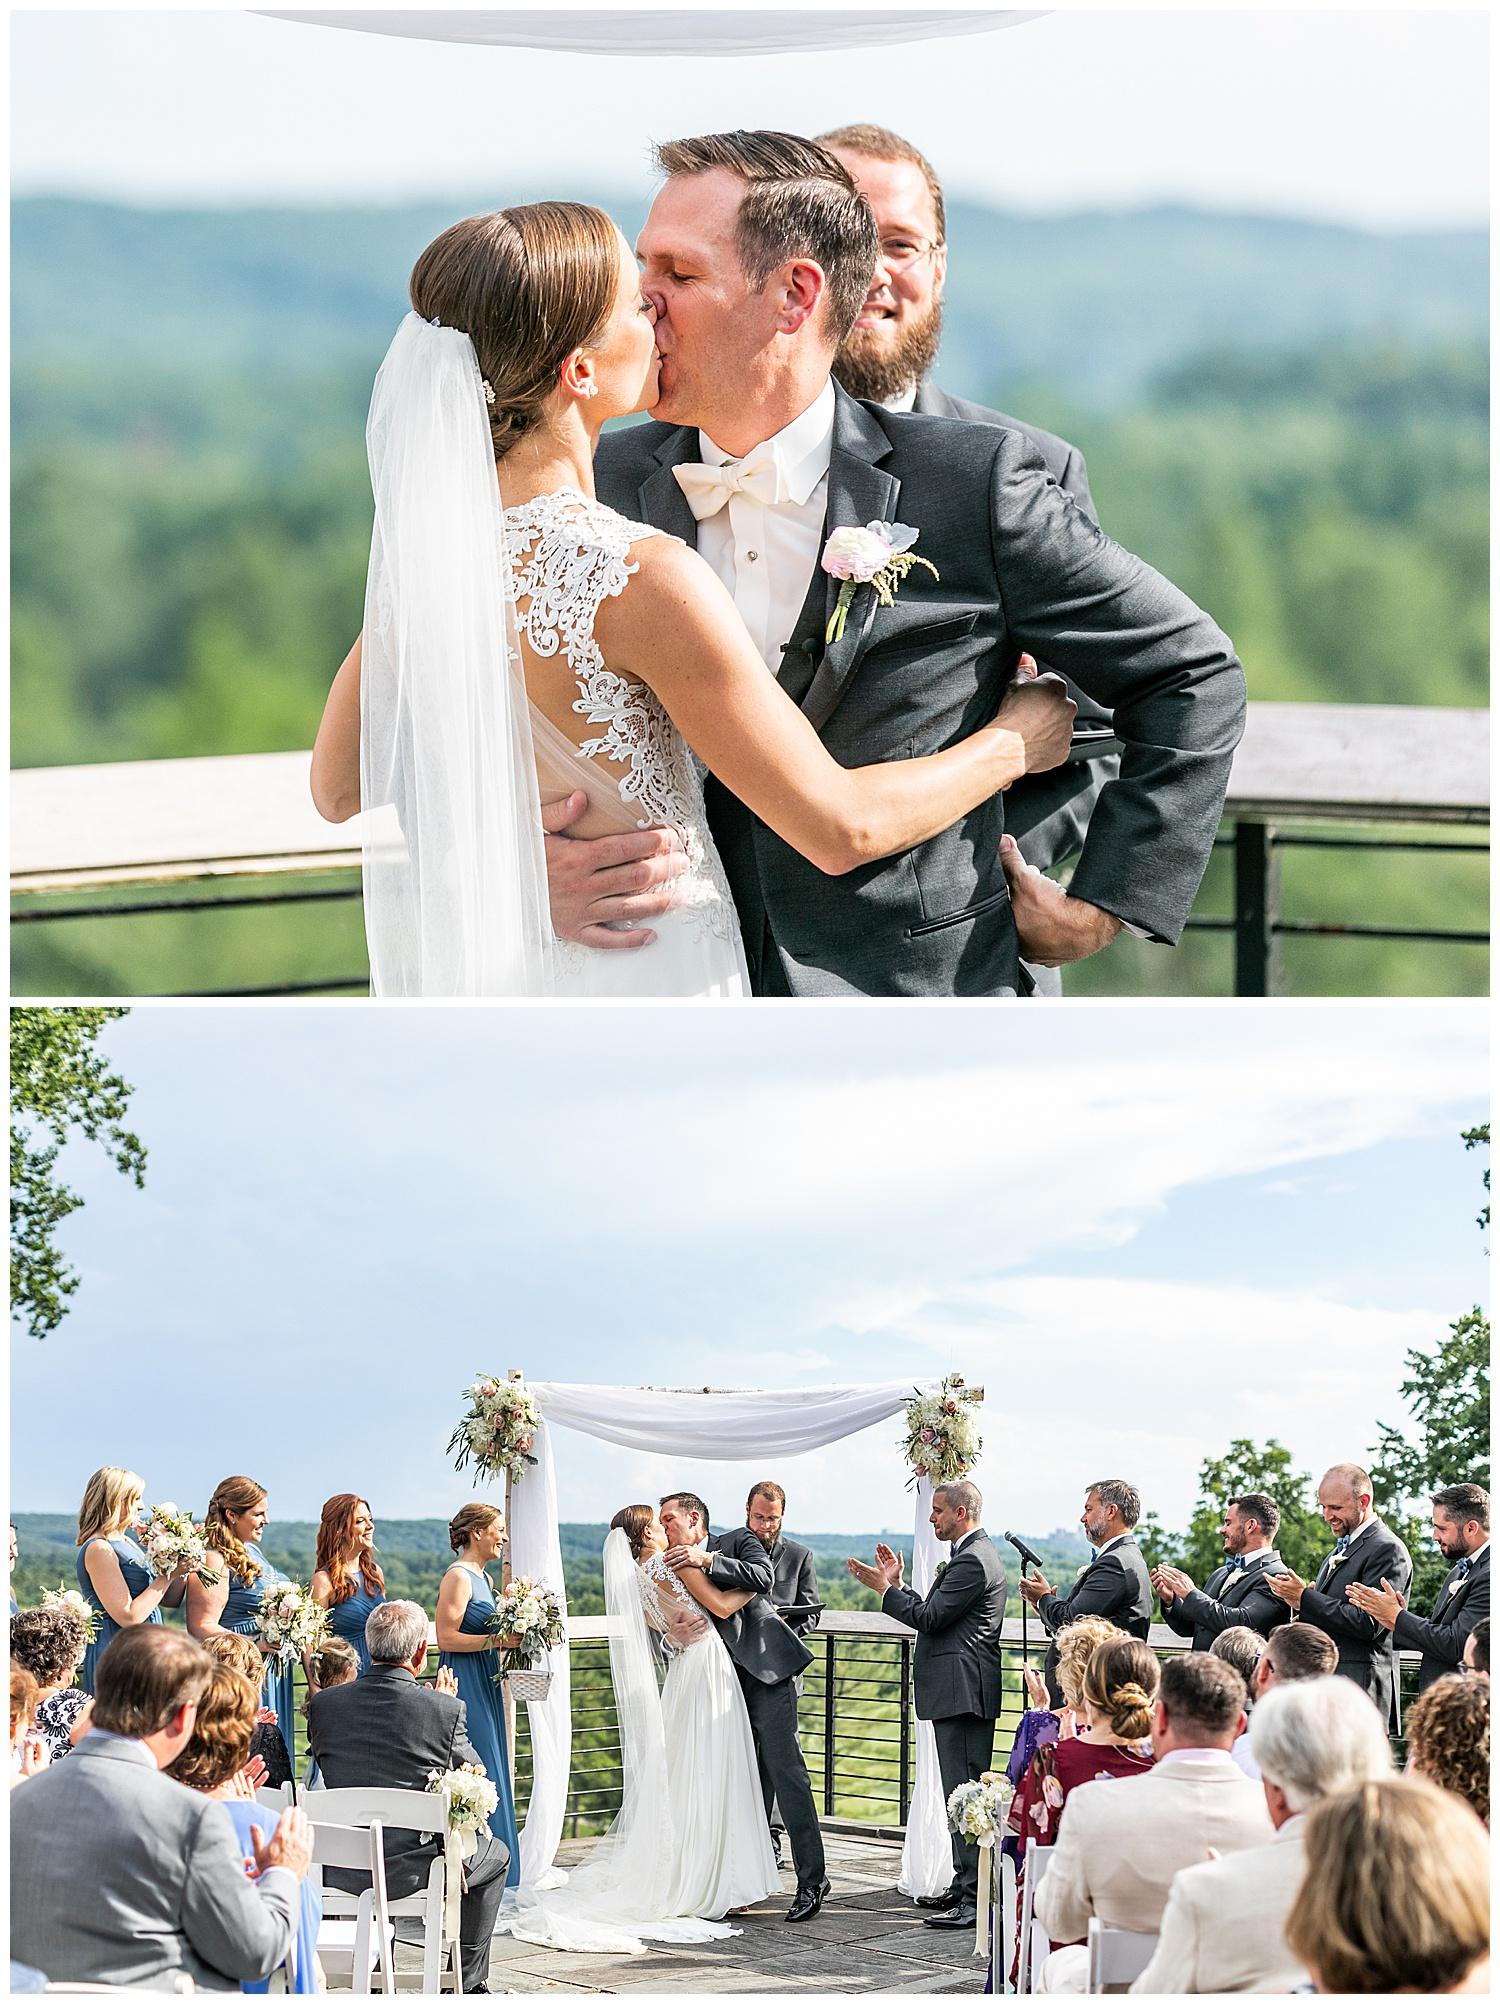 Lindsay Josh Eagles Nest Country Club Wedding Living Radiant Photography photos_0055.jpg